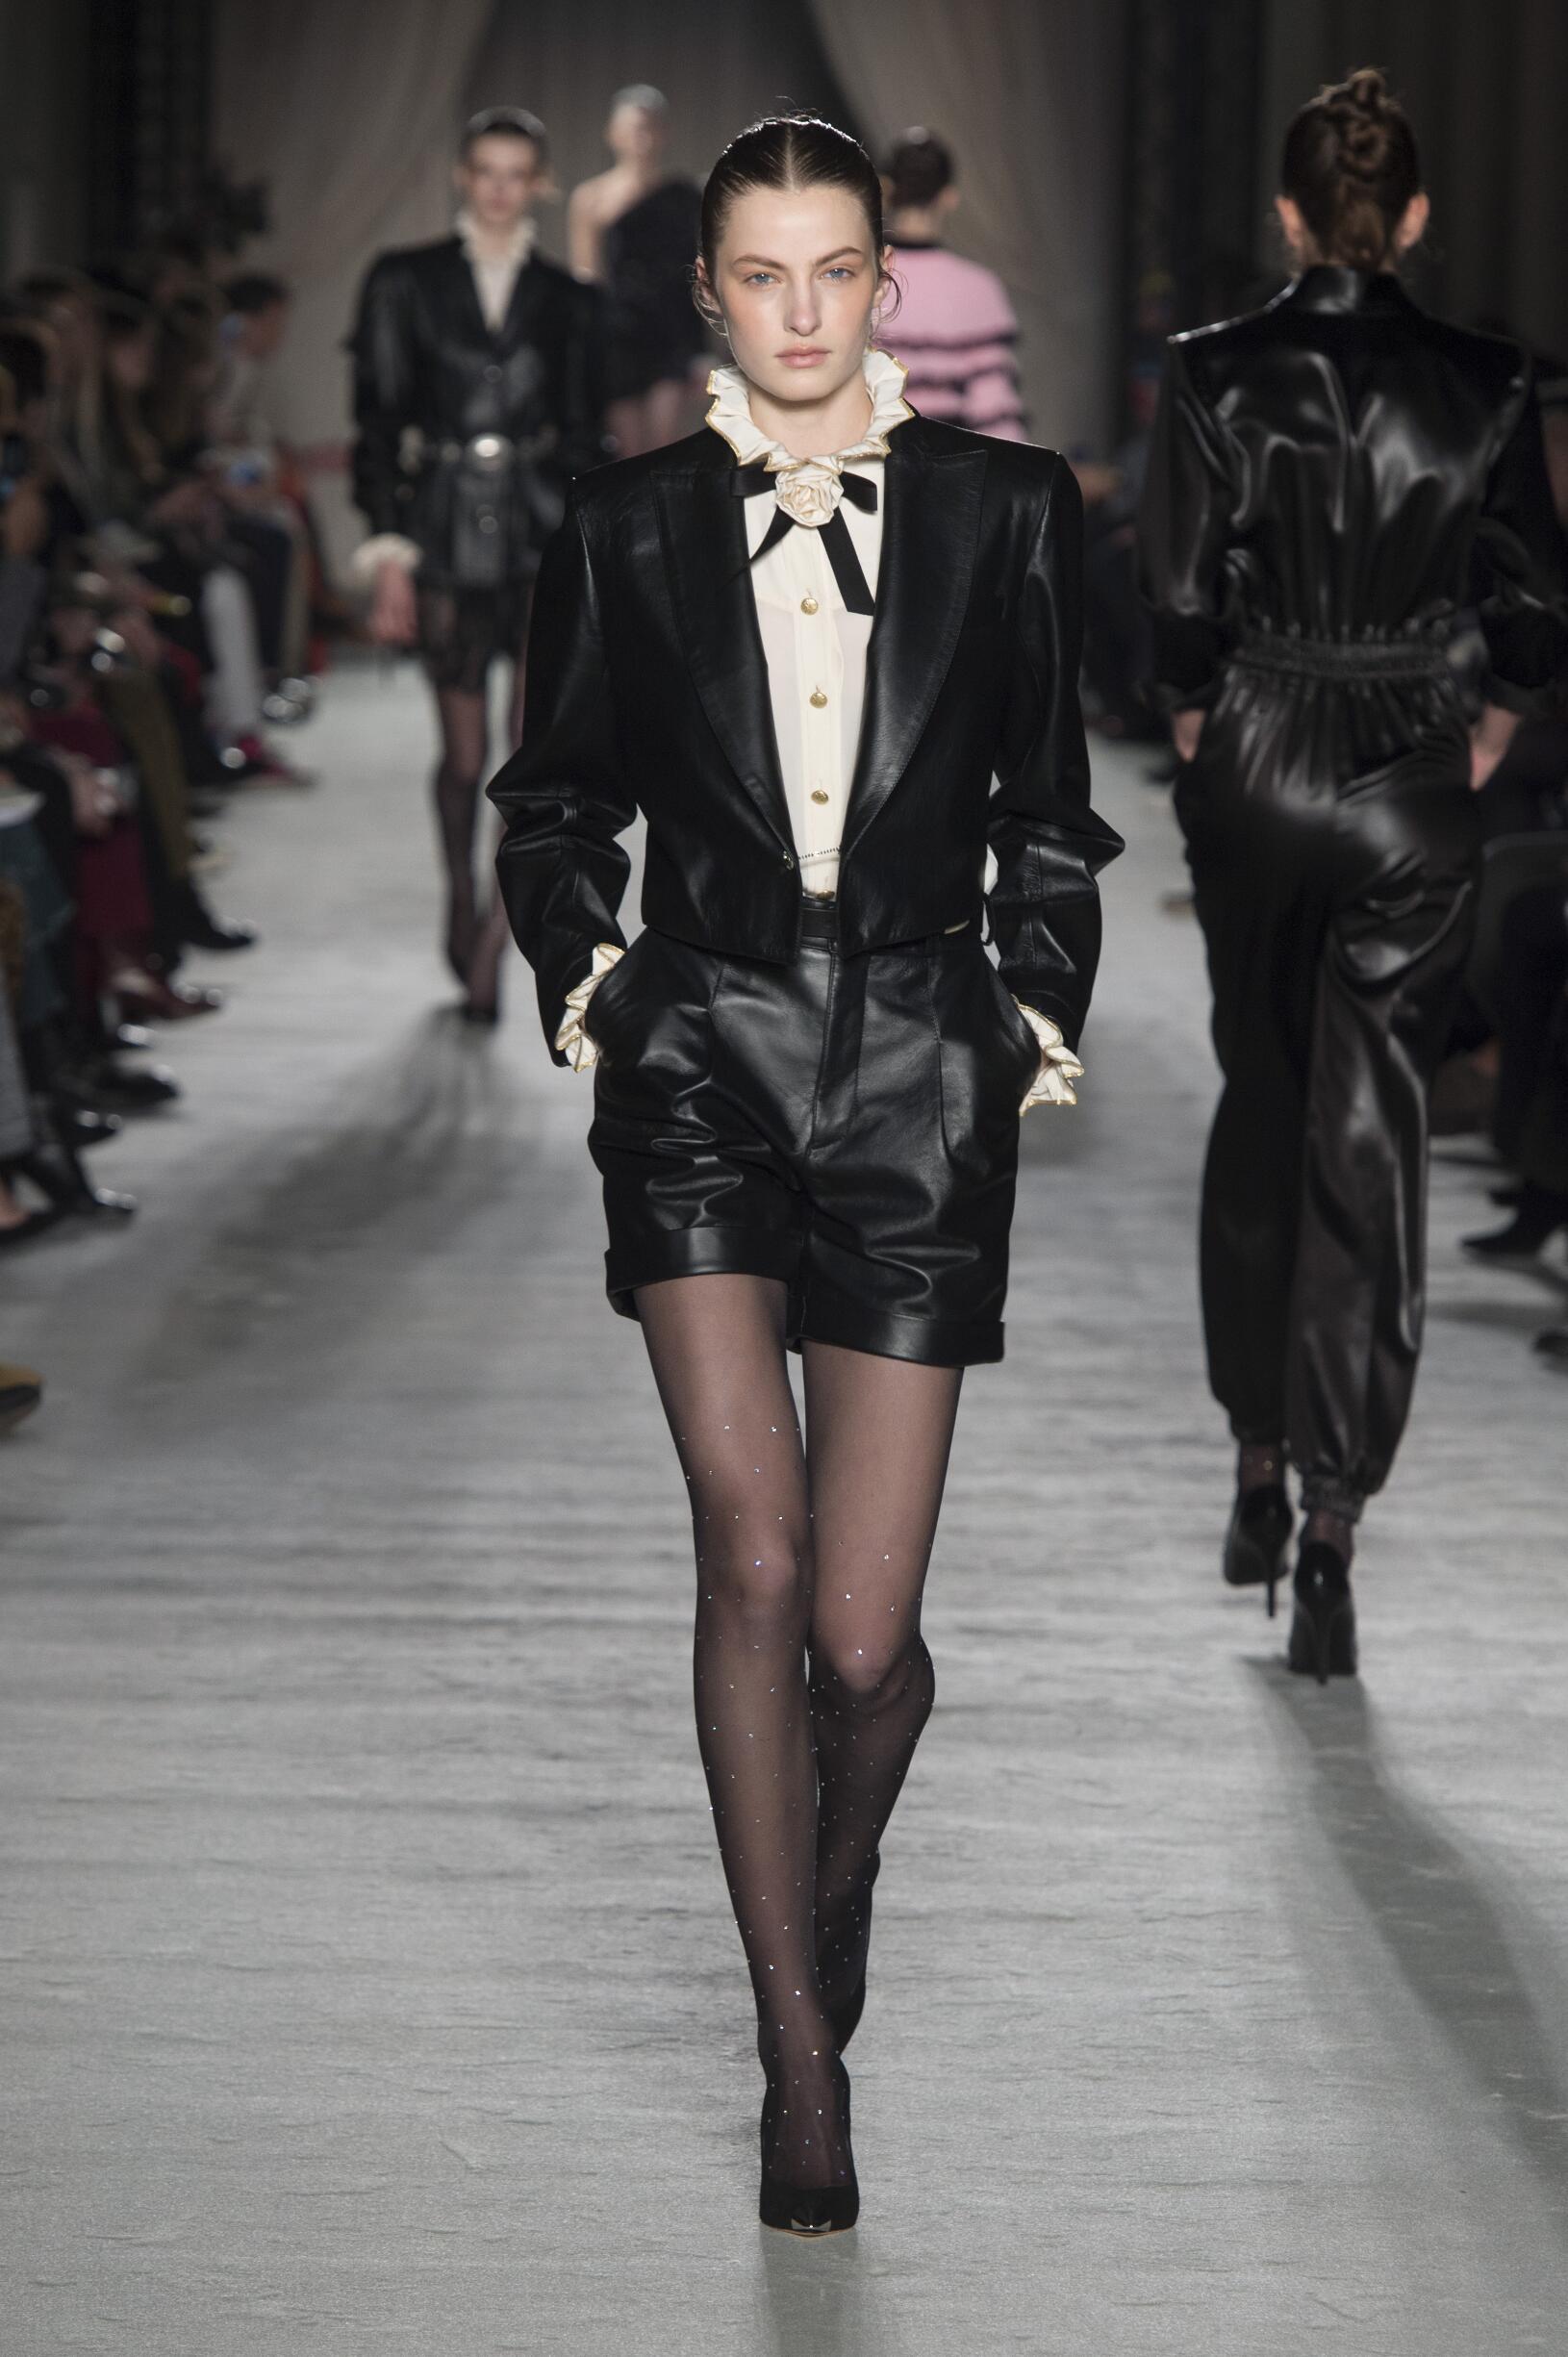 FW 2018-19 Philosophy di Lorenzo Serafini Fashion Show Milan